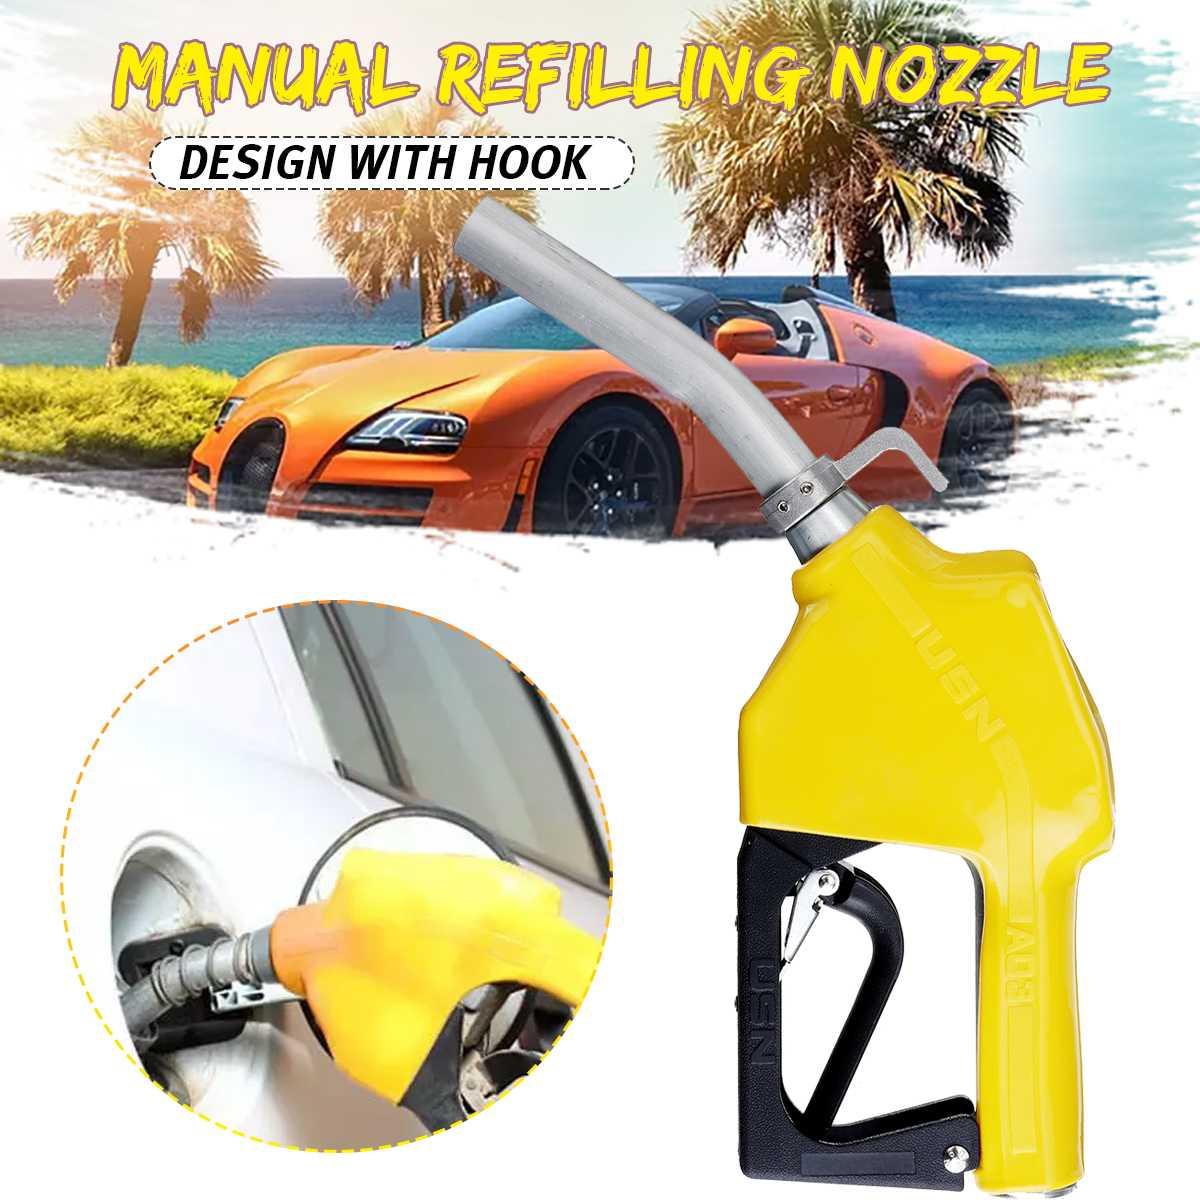 Car Fuel Filling Nozzle-Gun Automatically Cuts Off The Diesel-Fuel-Gun Aluminium alloy 3 speeds Adjustable